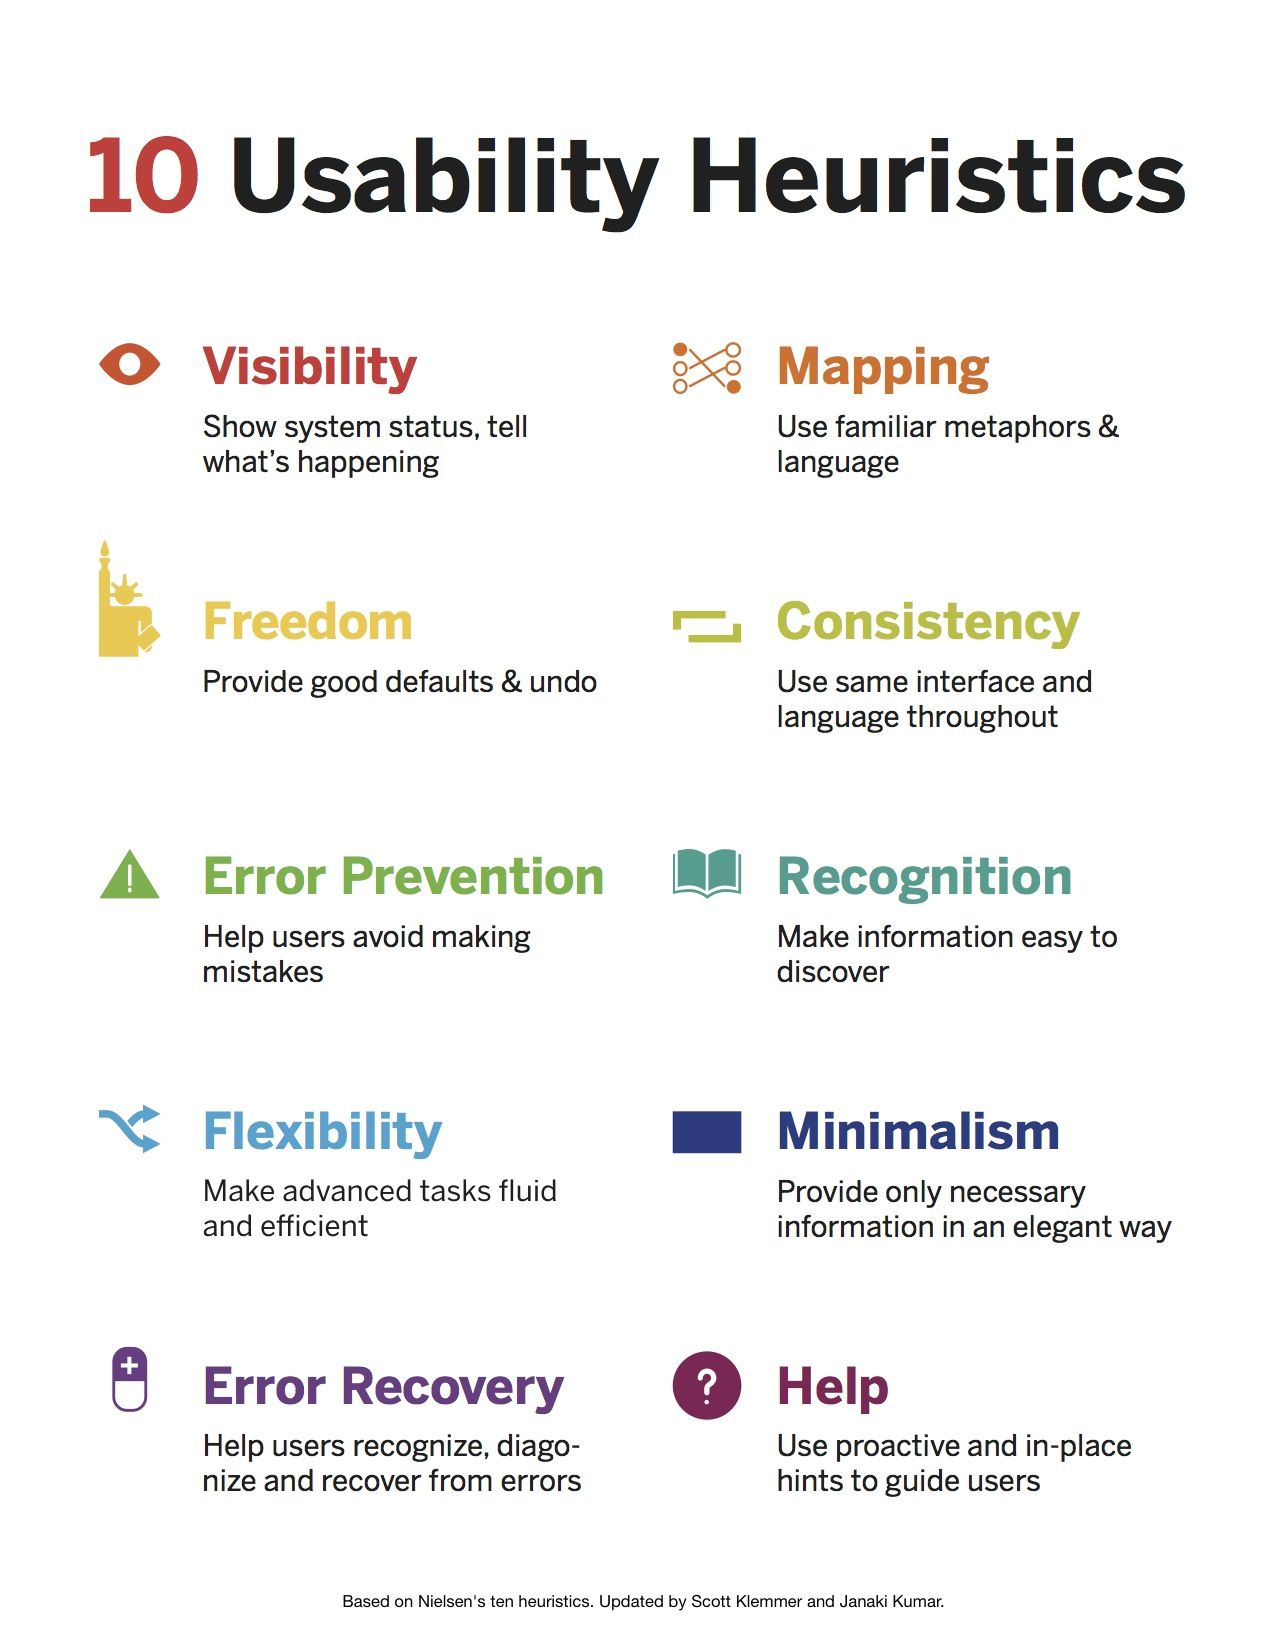 10 Usability Heuristics Coursera Ux Design Principles Design Thinking Ux Design